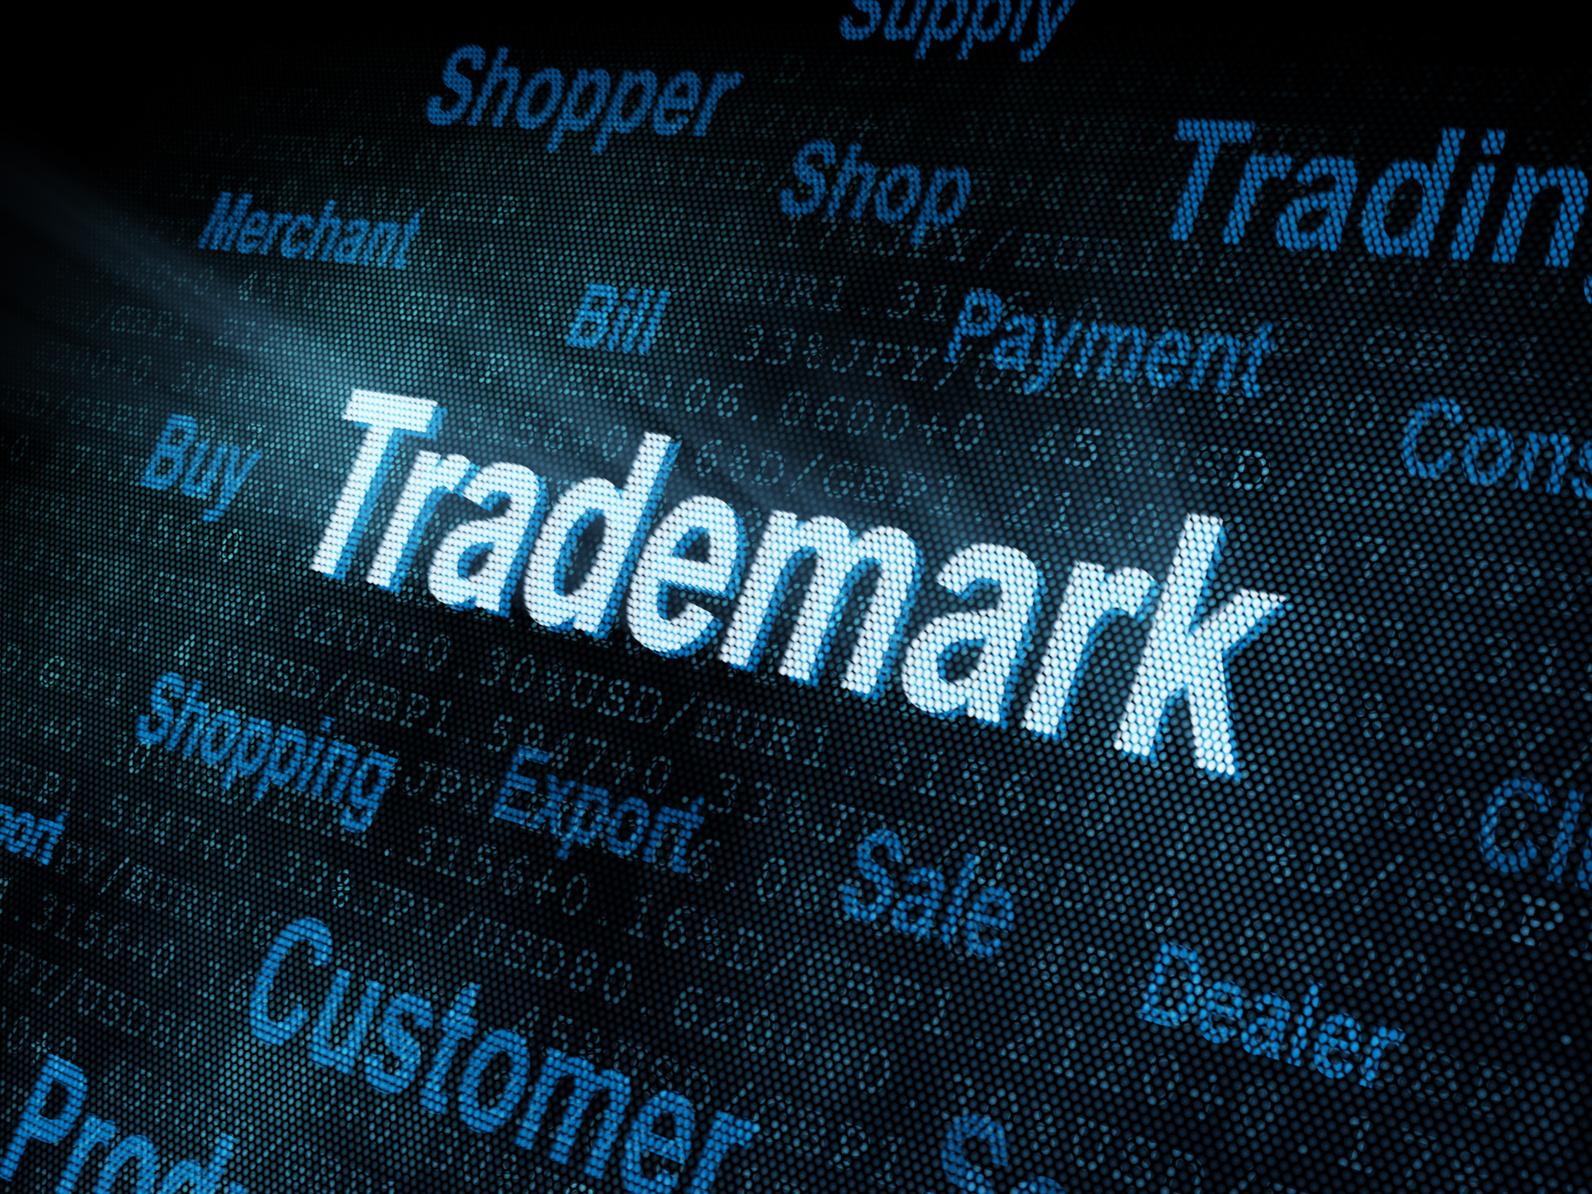 Pixeled word Trademark on digital screen